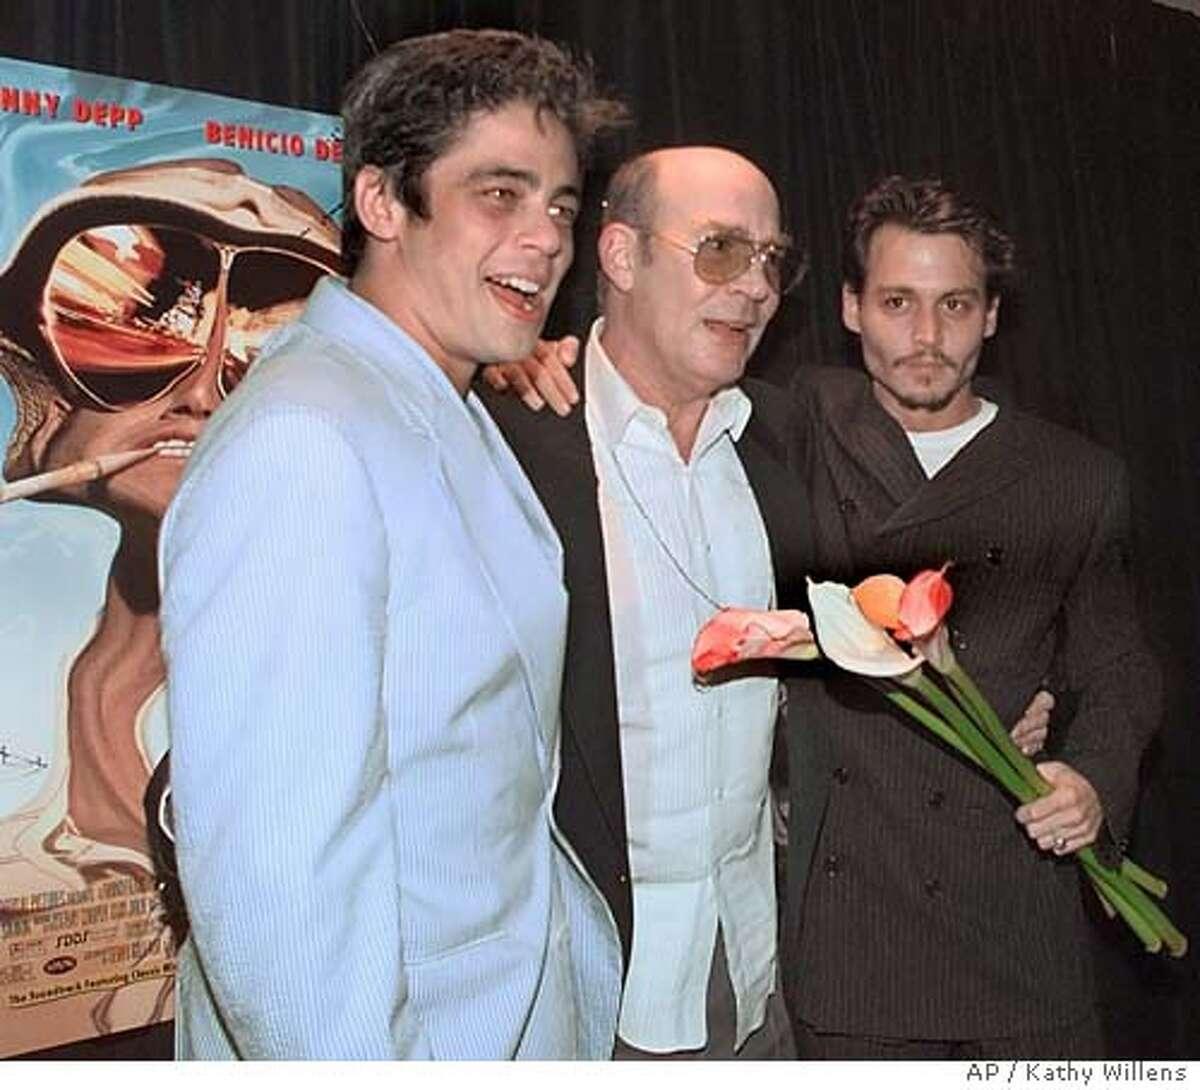 Co-stars Benicio Del Toro, left, and Johnny Depp, right, join Hunter Thompson, center, author of the classic pop culture novel